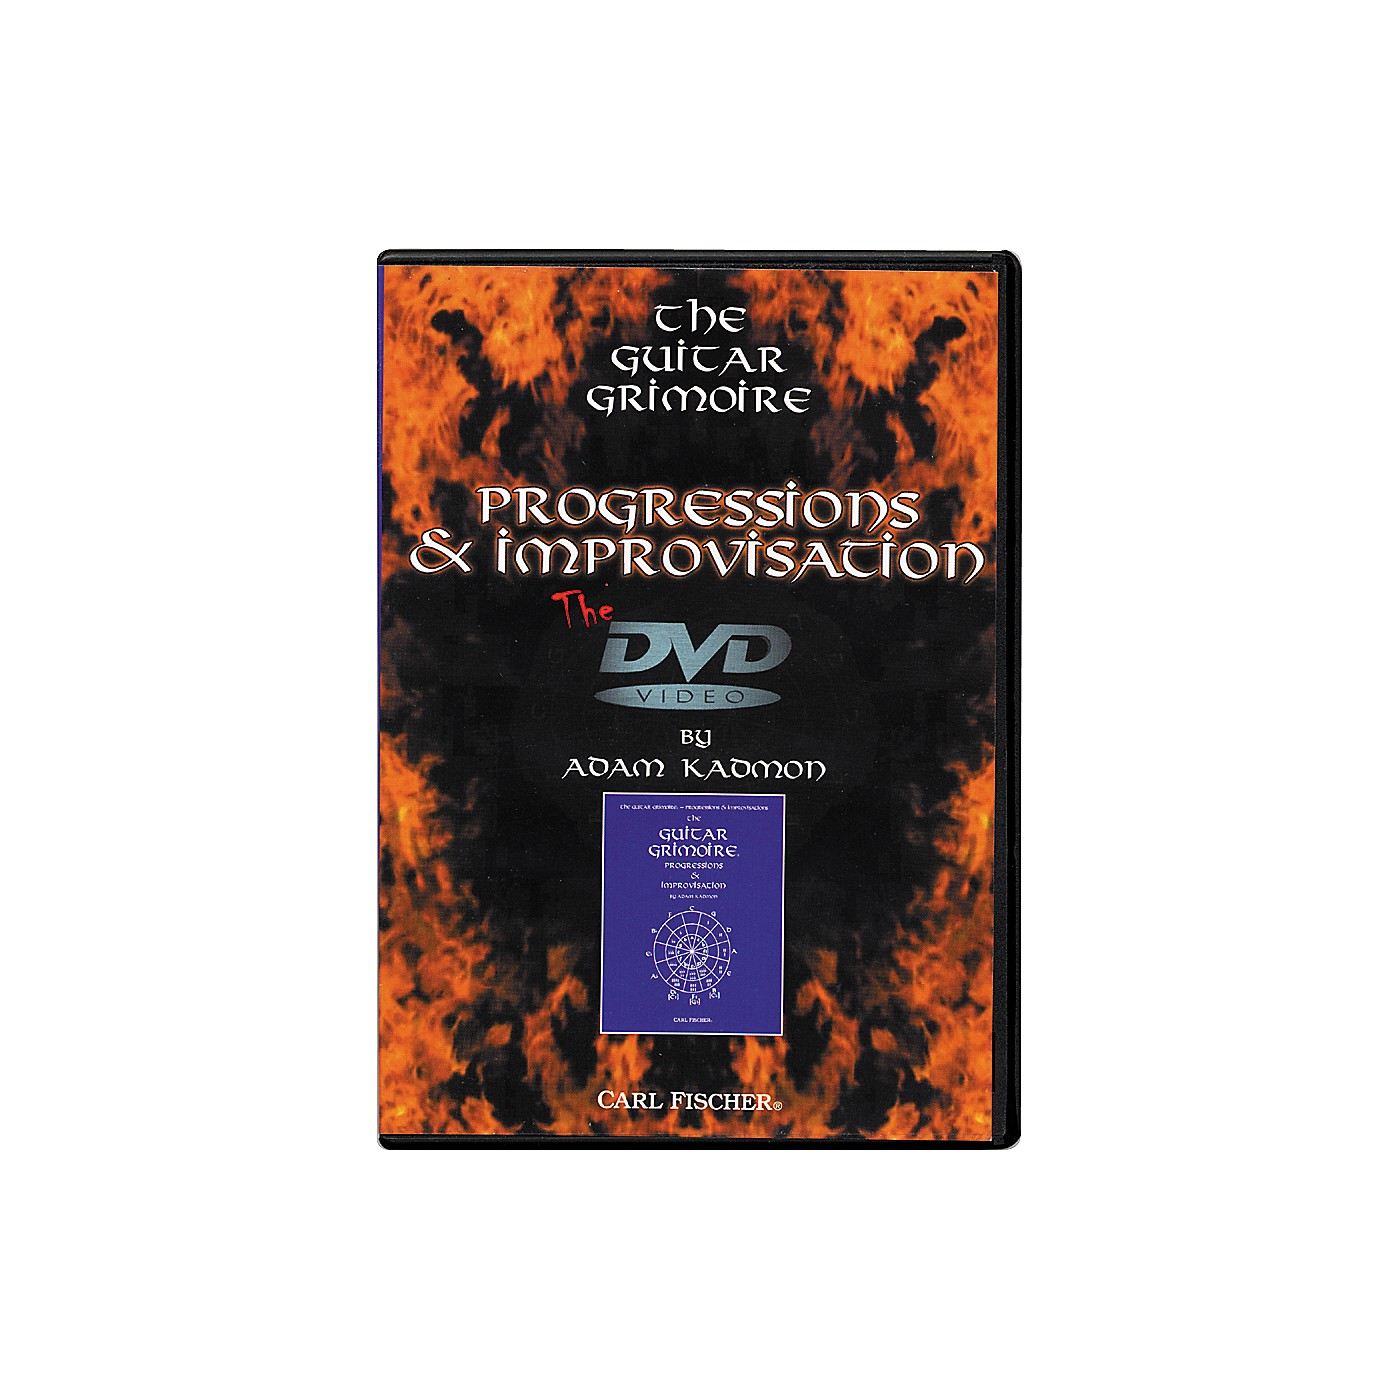 Carl Fischer Guitar Grimoire Vol. 3 Progressions and Improvisations DVD thumbnail